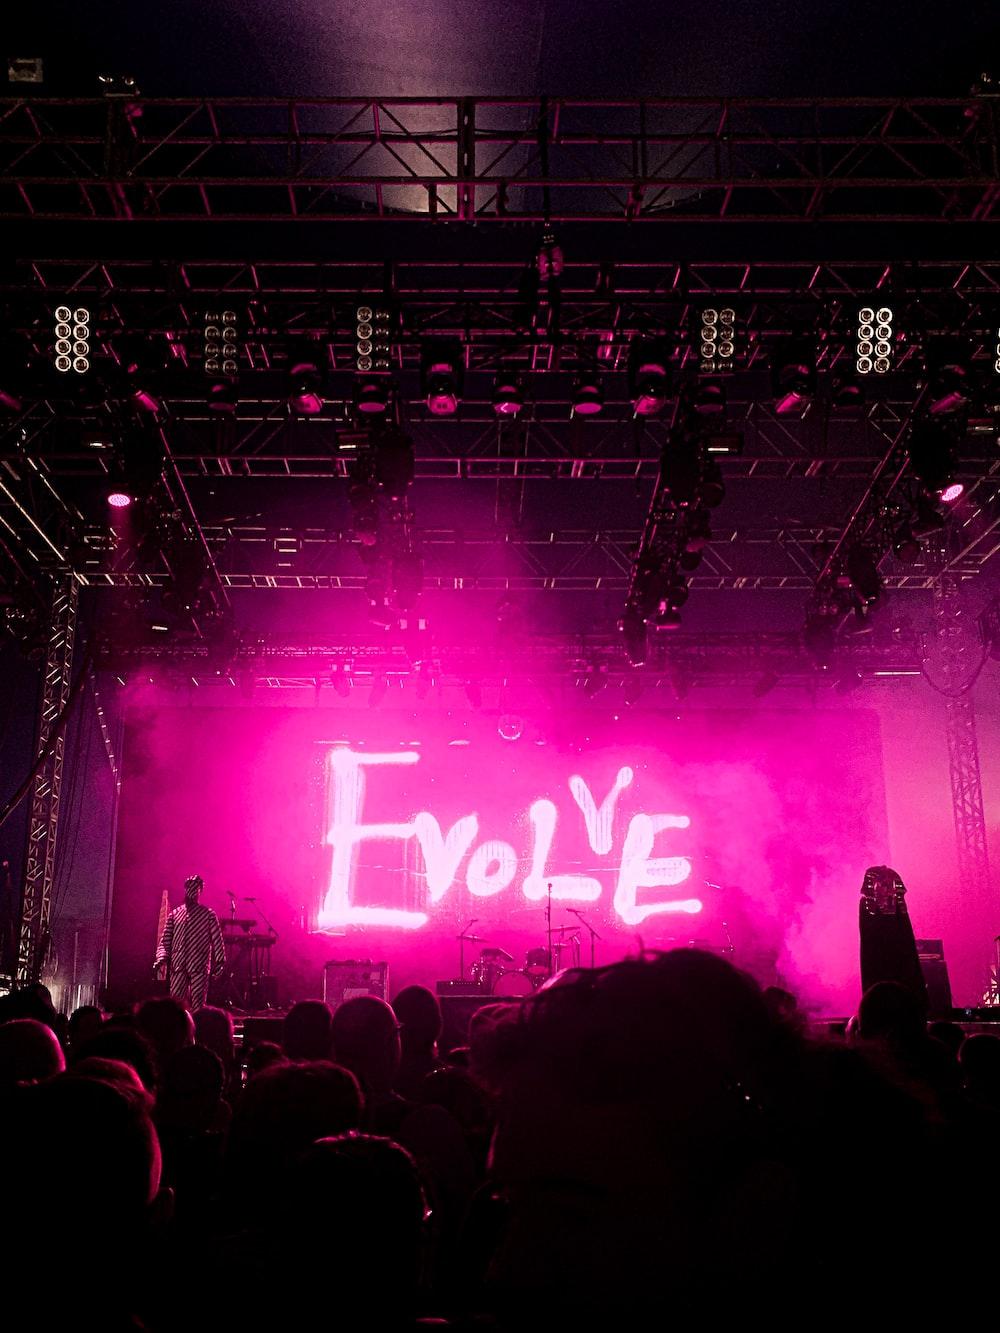 pink Evolve stage neon signage